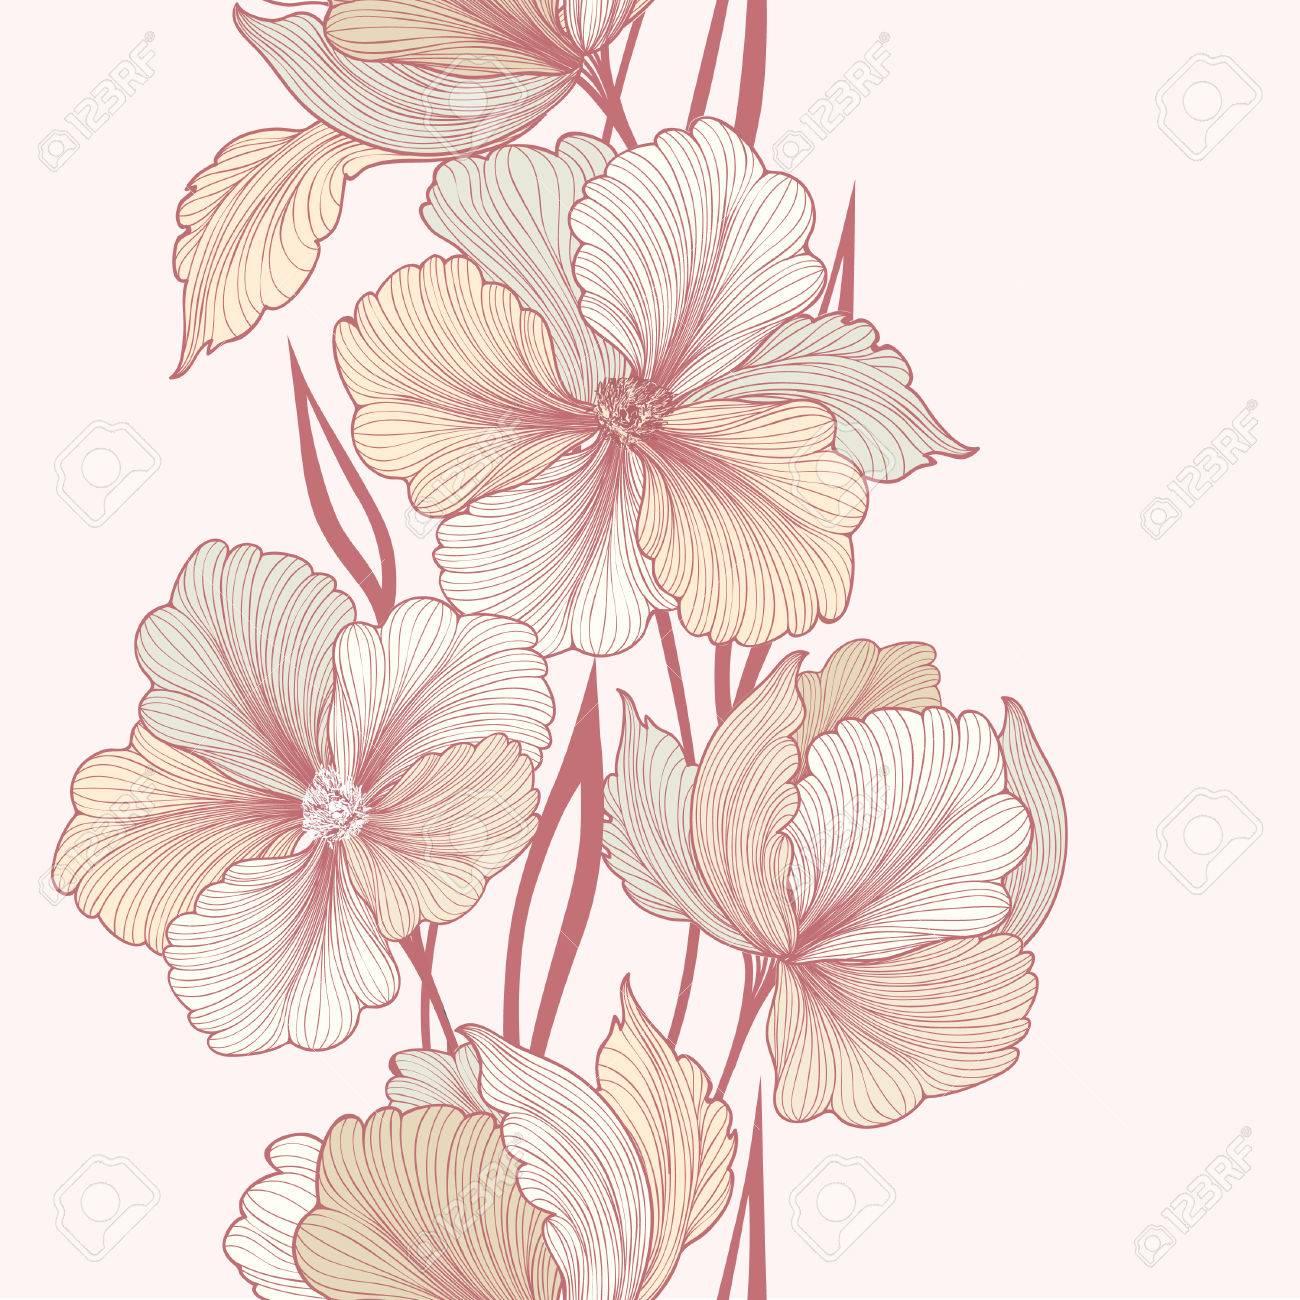 Floral background. Greeting card with flower. Flourish border. Gentle decor with summer flower dahlia. Gentle flourish vector illustration - 51737760